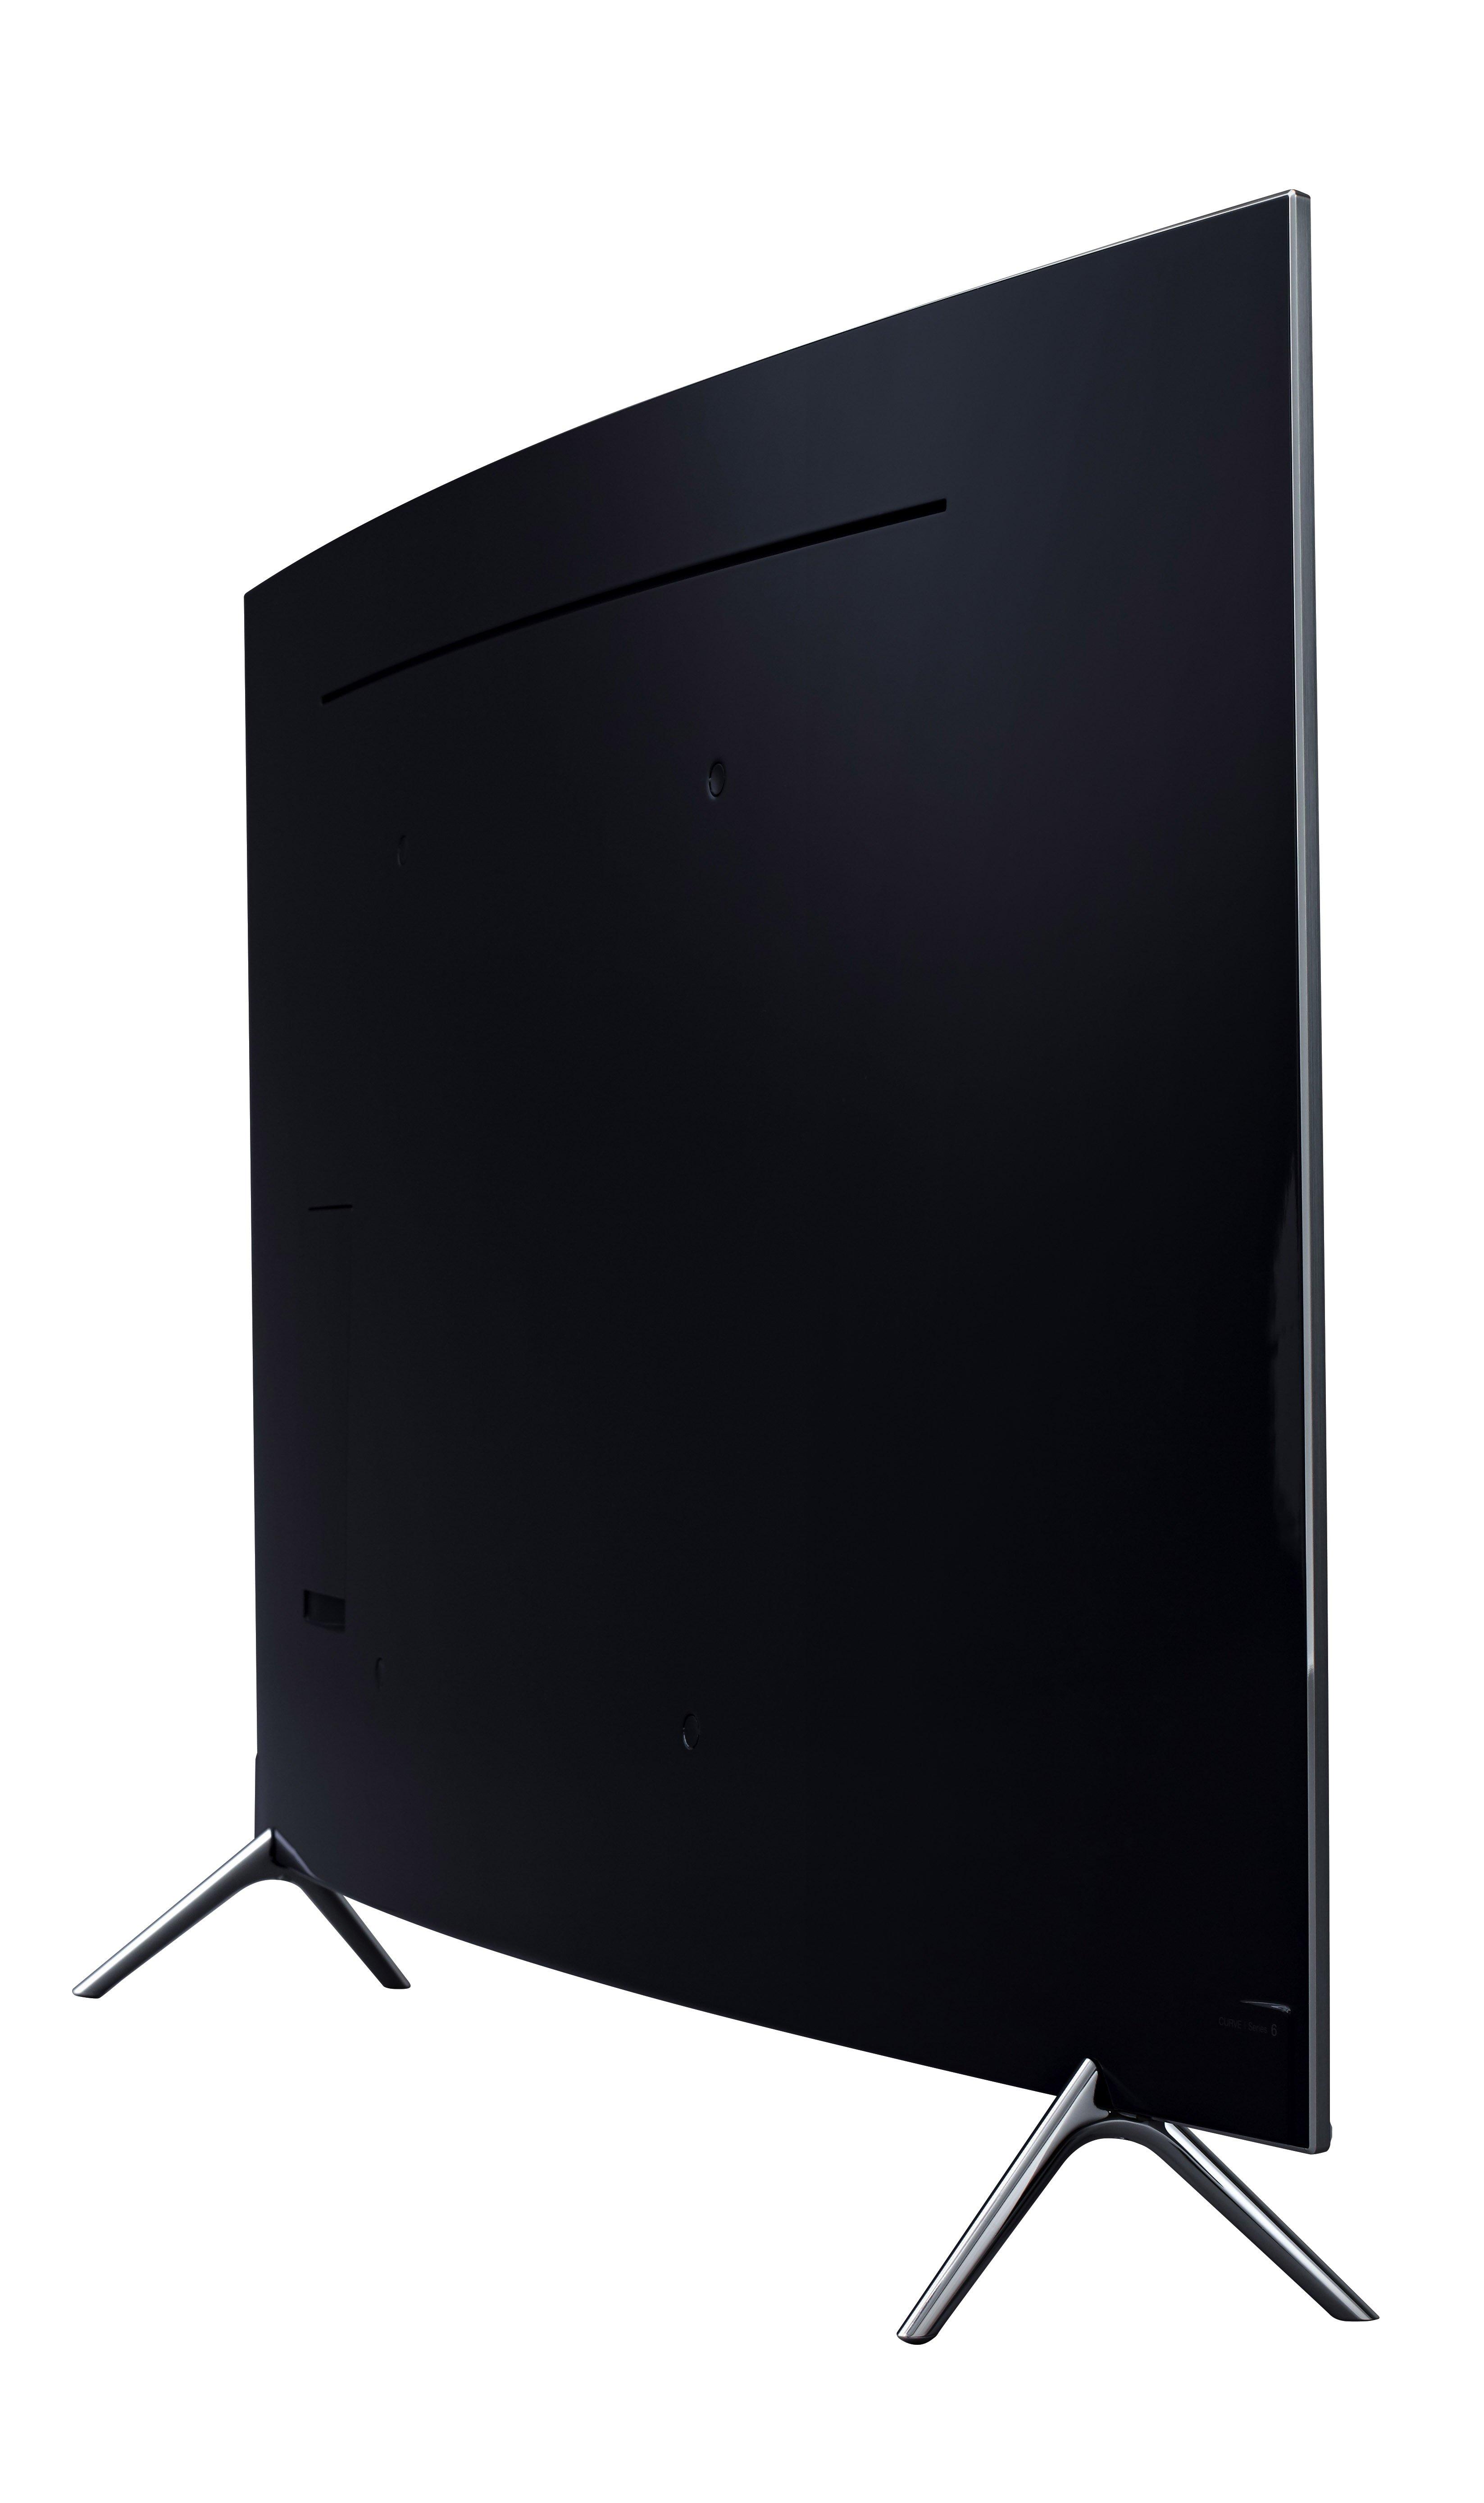 Samsung Ue55ks7500 Side